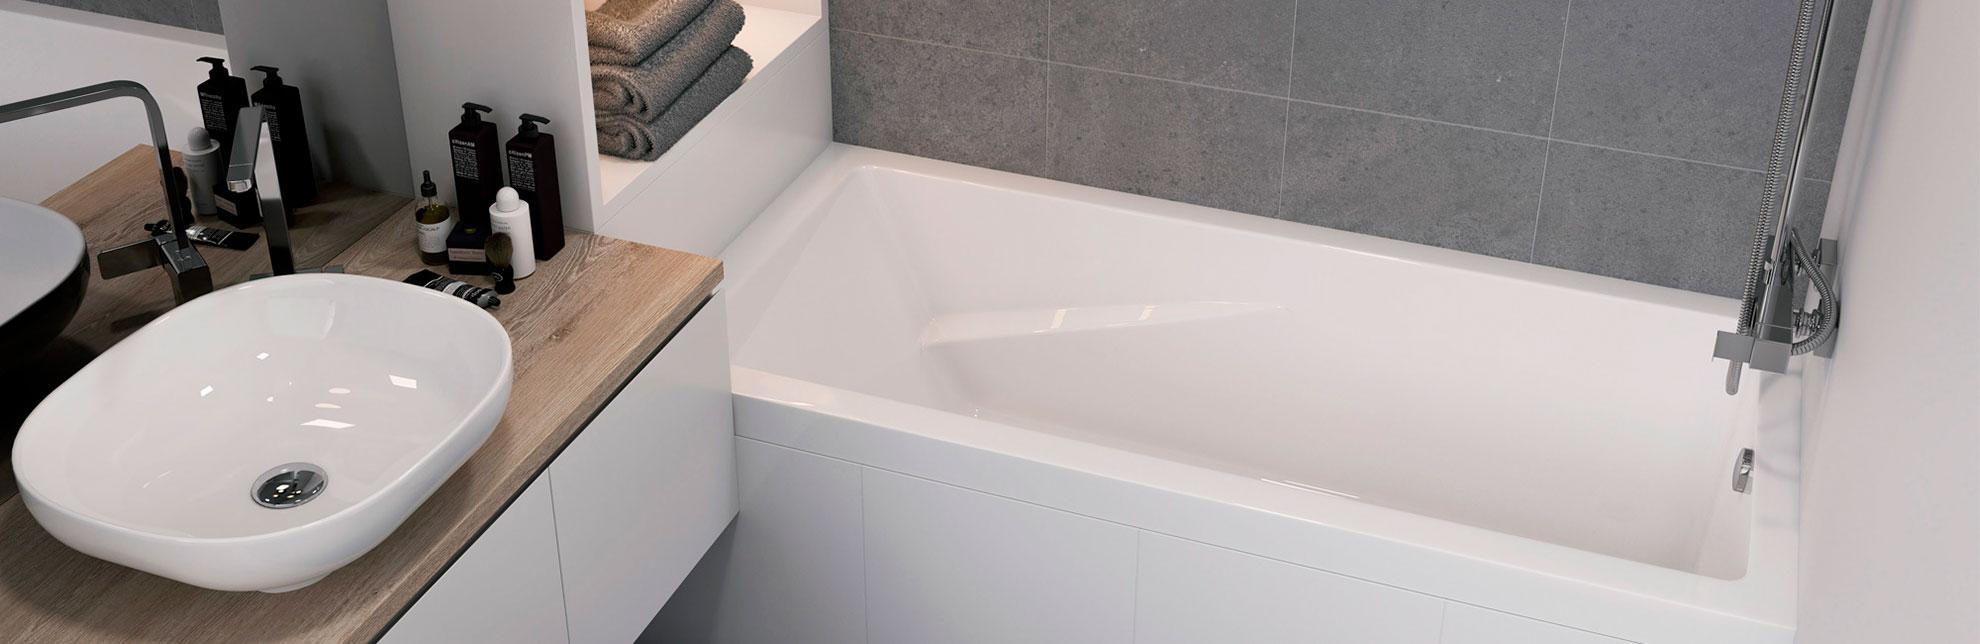 265 Bathtub Refinishing Reglazing, Bathroom Reglazing Nyc